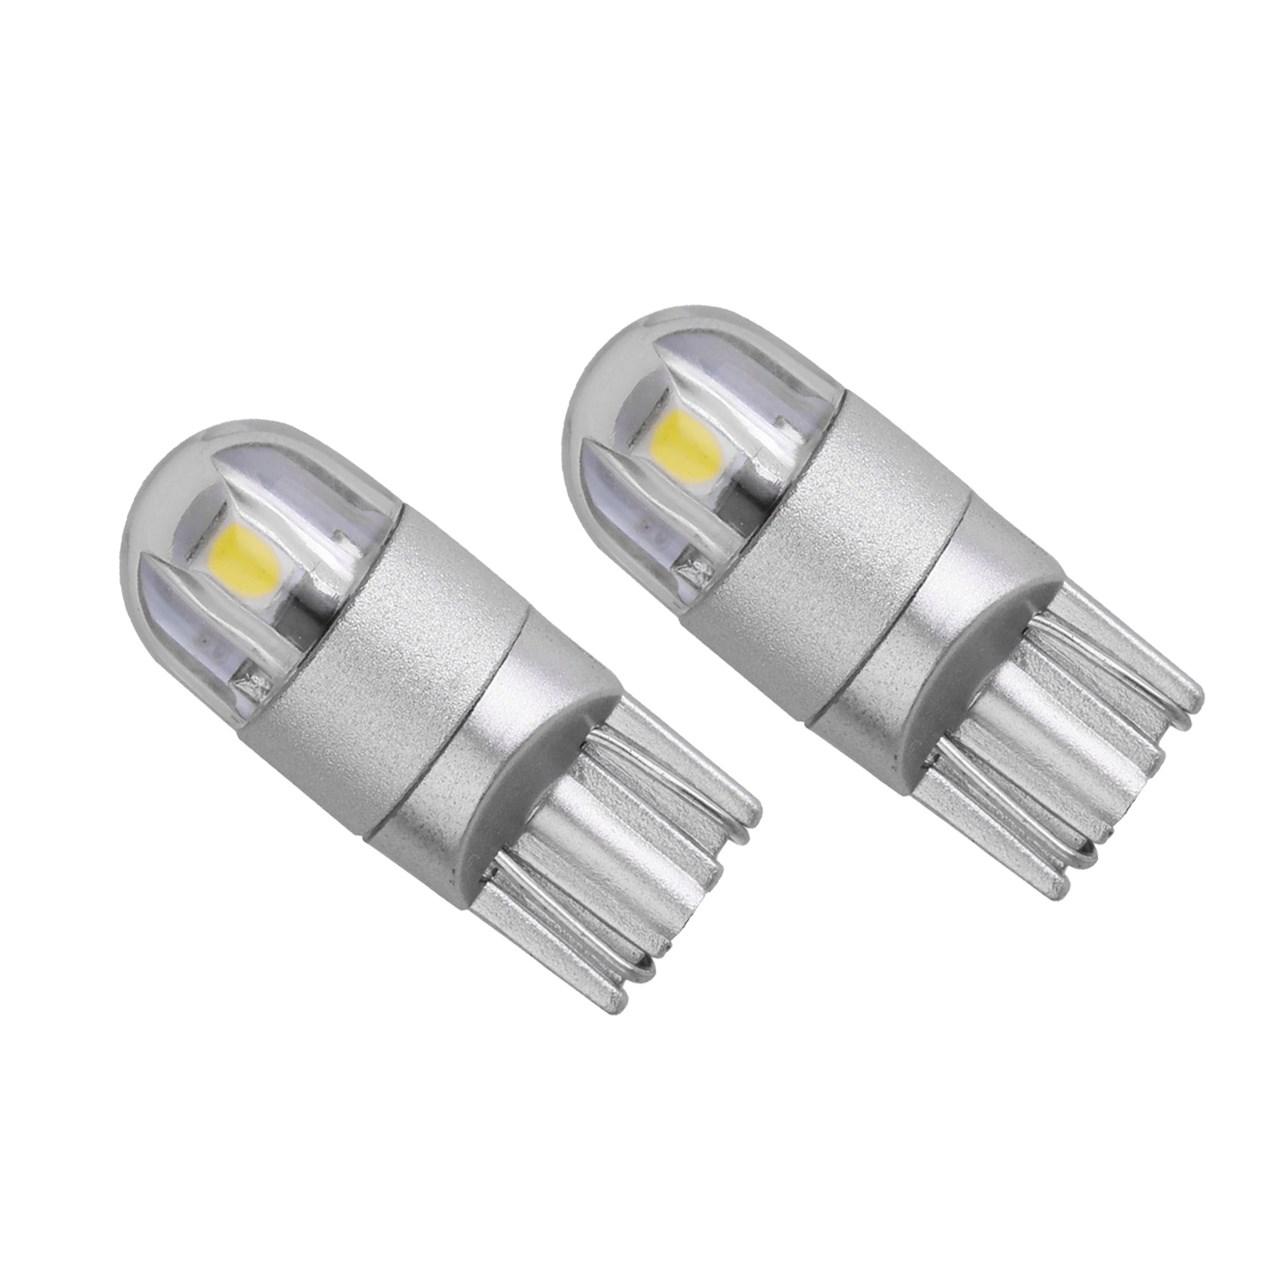 لامپ خودرو TOBYS مدل T10